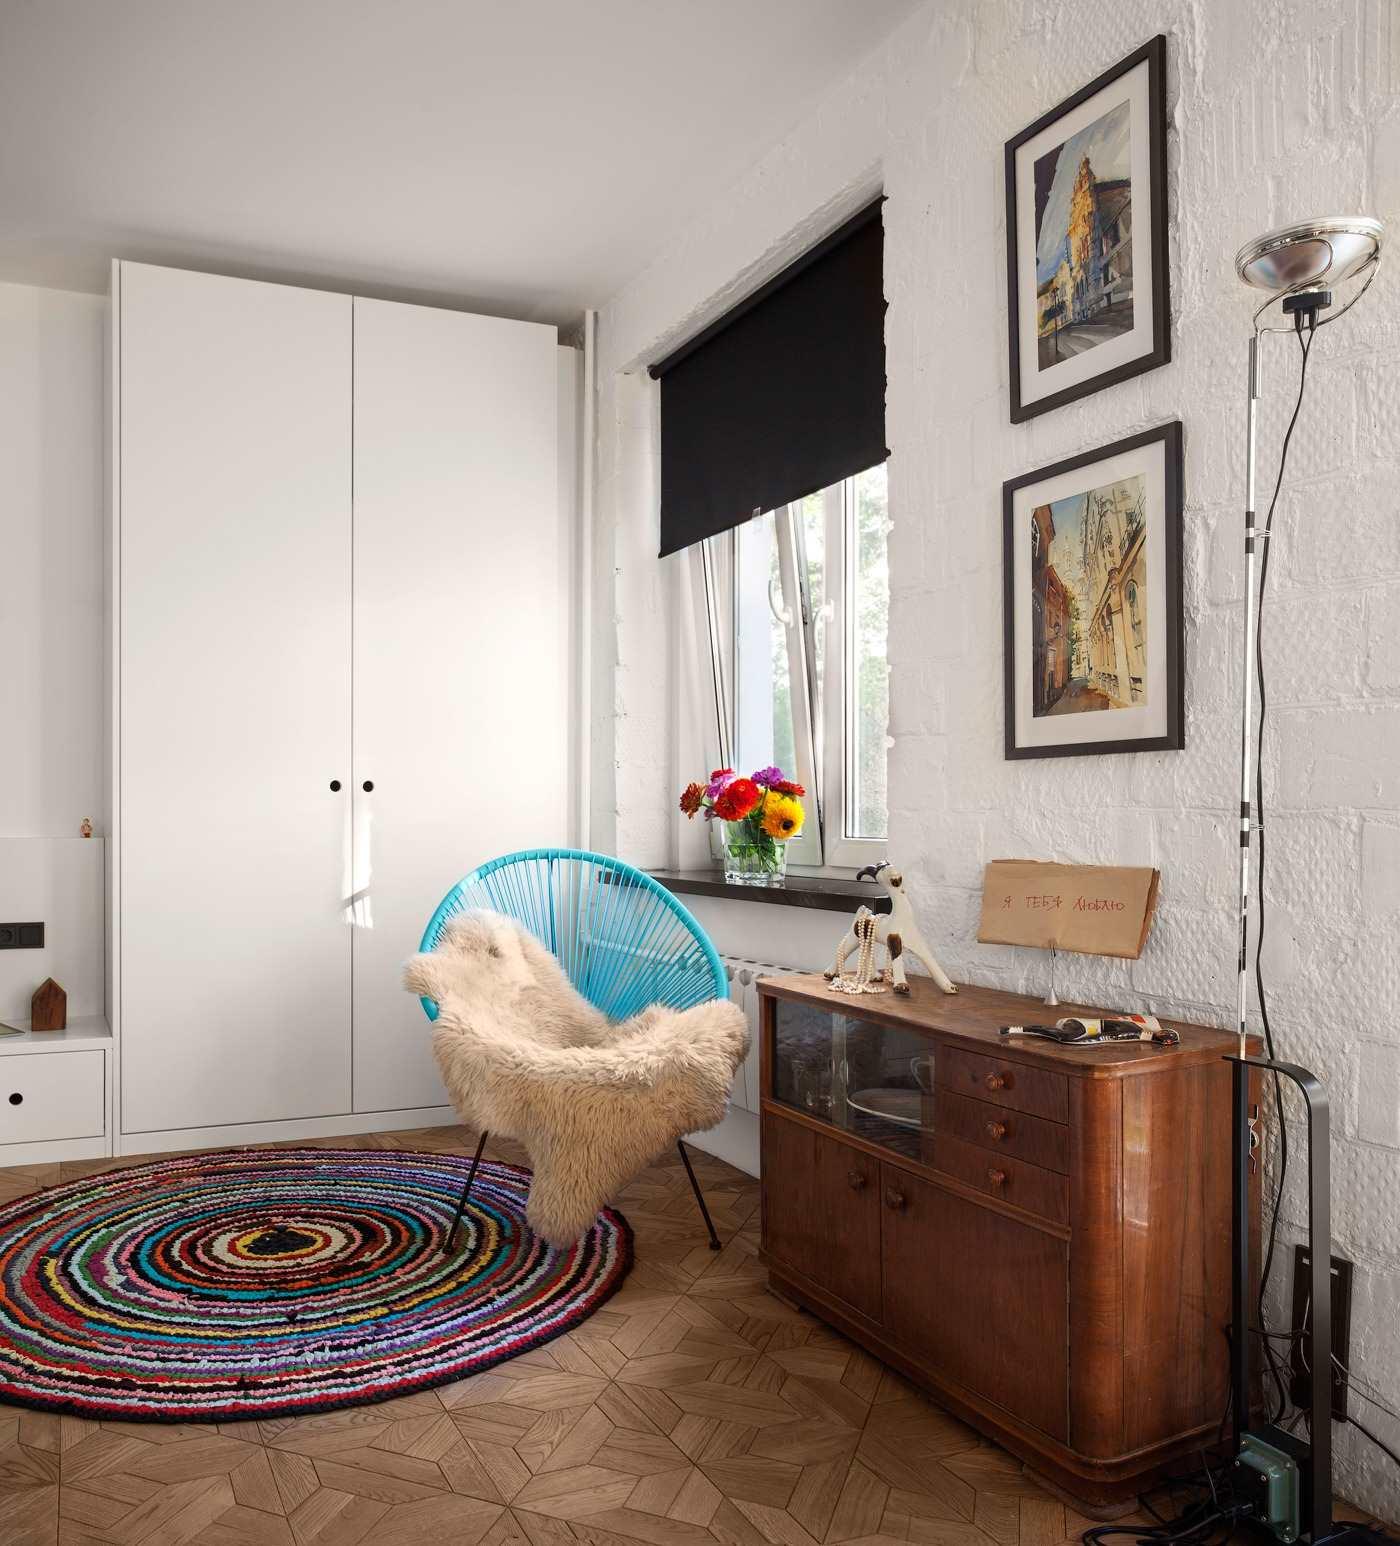 Дизайн однокомнатной квартира 43 кв.м. с фото (7)